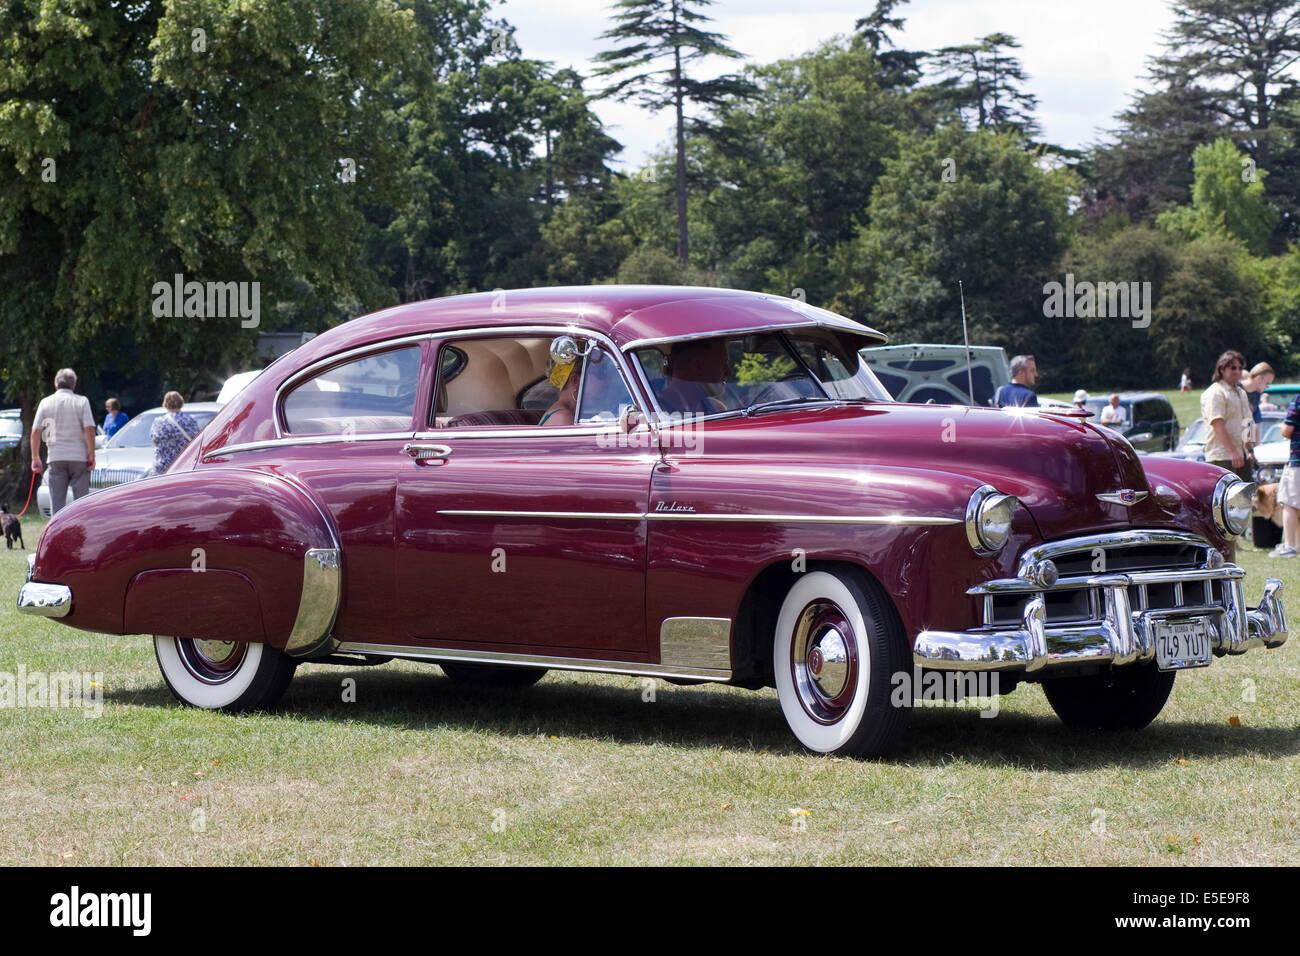 1948 Chevrolet Fleetline Aerosedan Coupe Stock Photo